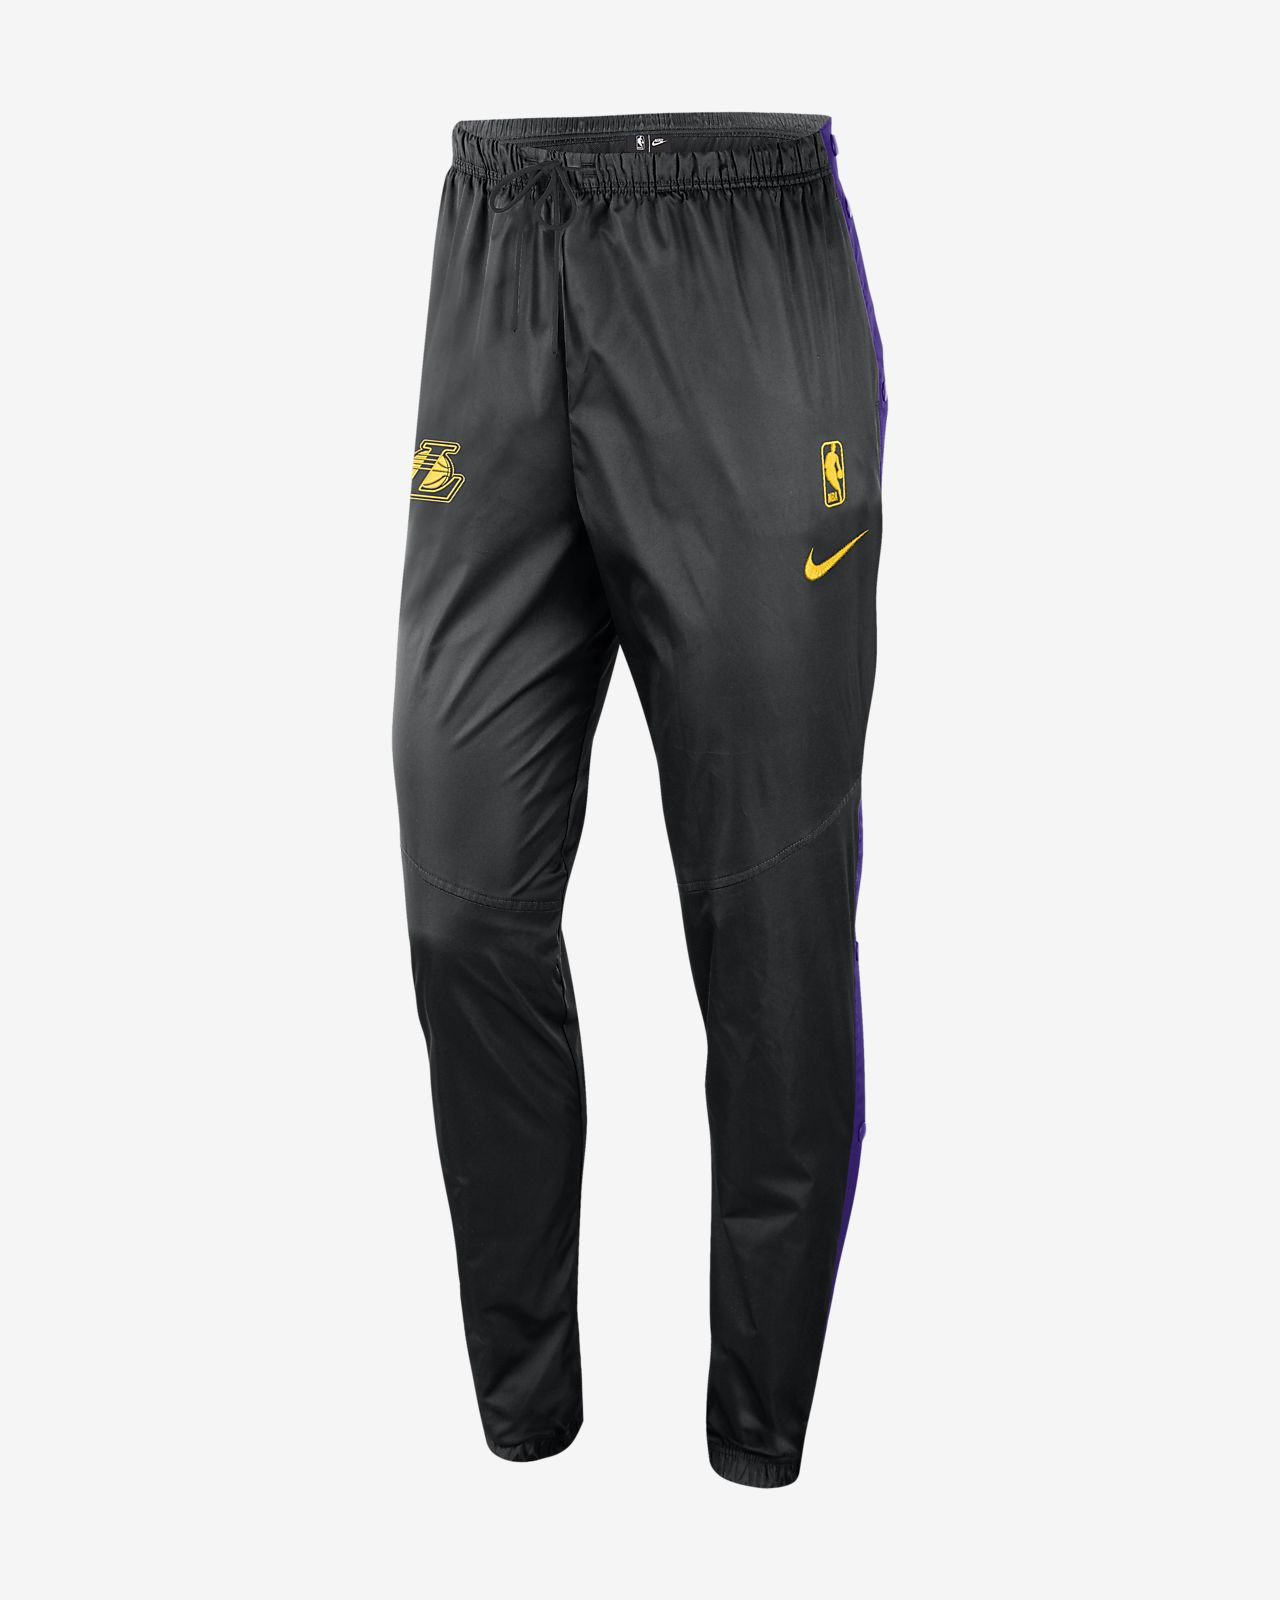 Los Angeles Lakers Nike Pantalons de l'NBA - Dona